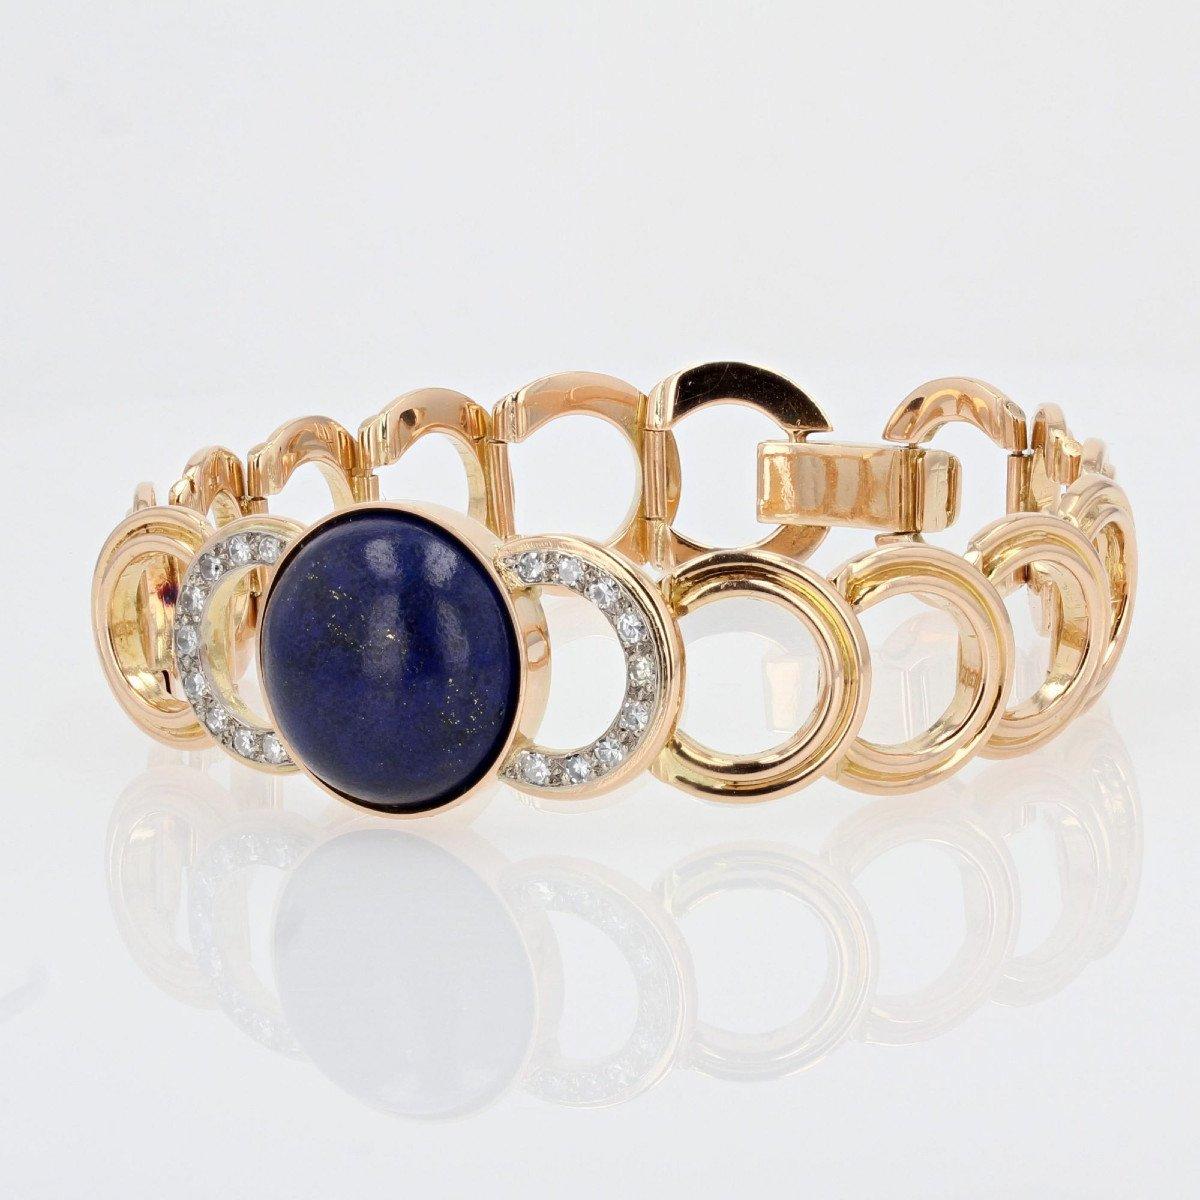 Gold Bracelet With Diamonds And Its Lapis Lazuli Cabochon-photo-4